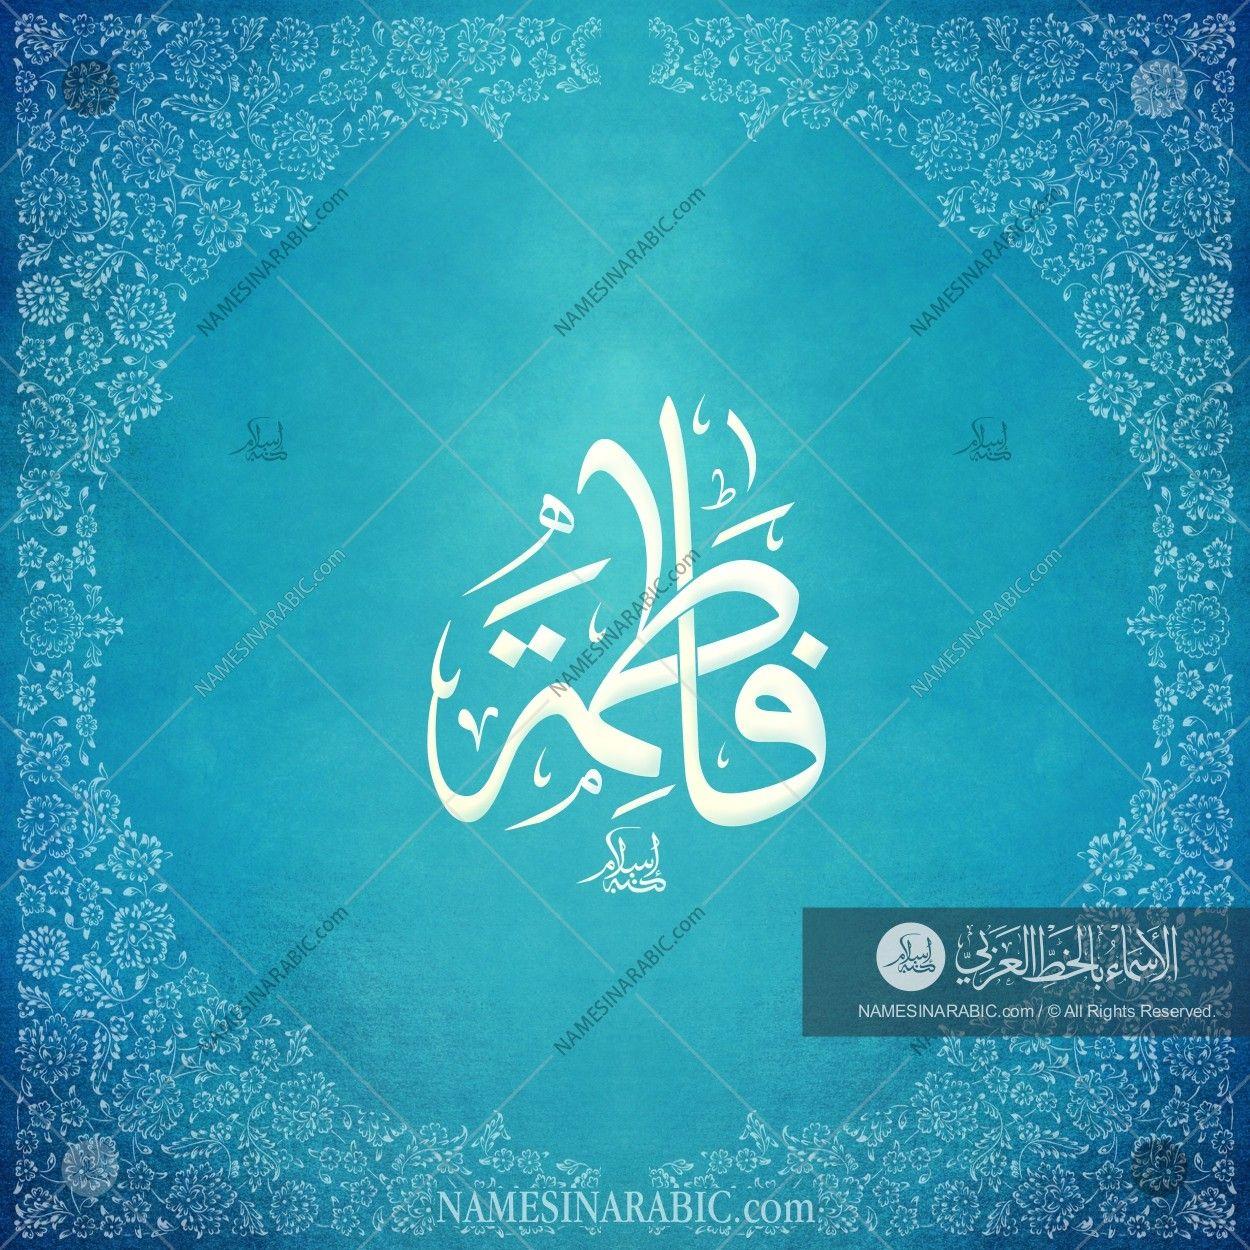 Fatima فاطمة Names In Arabic Calligraphy Name 8452 Calligraphy Name Islamic Art Calligraphy Arabic Calligraphy Artwork